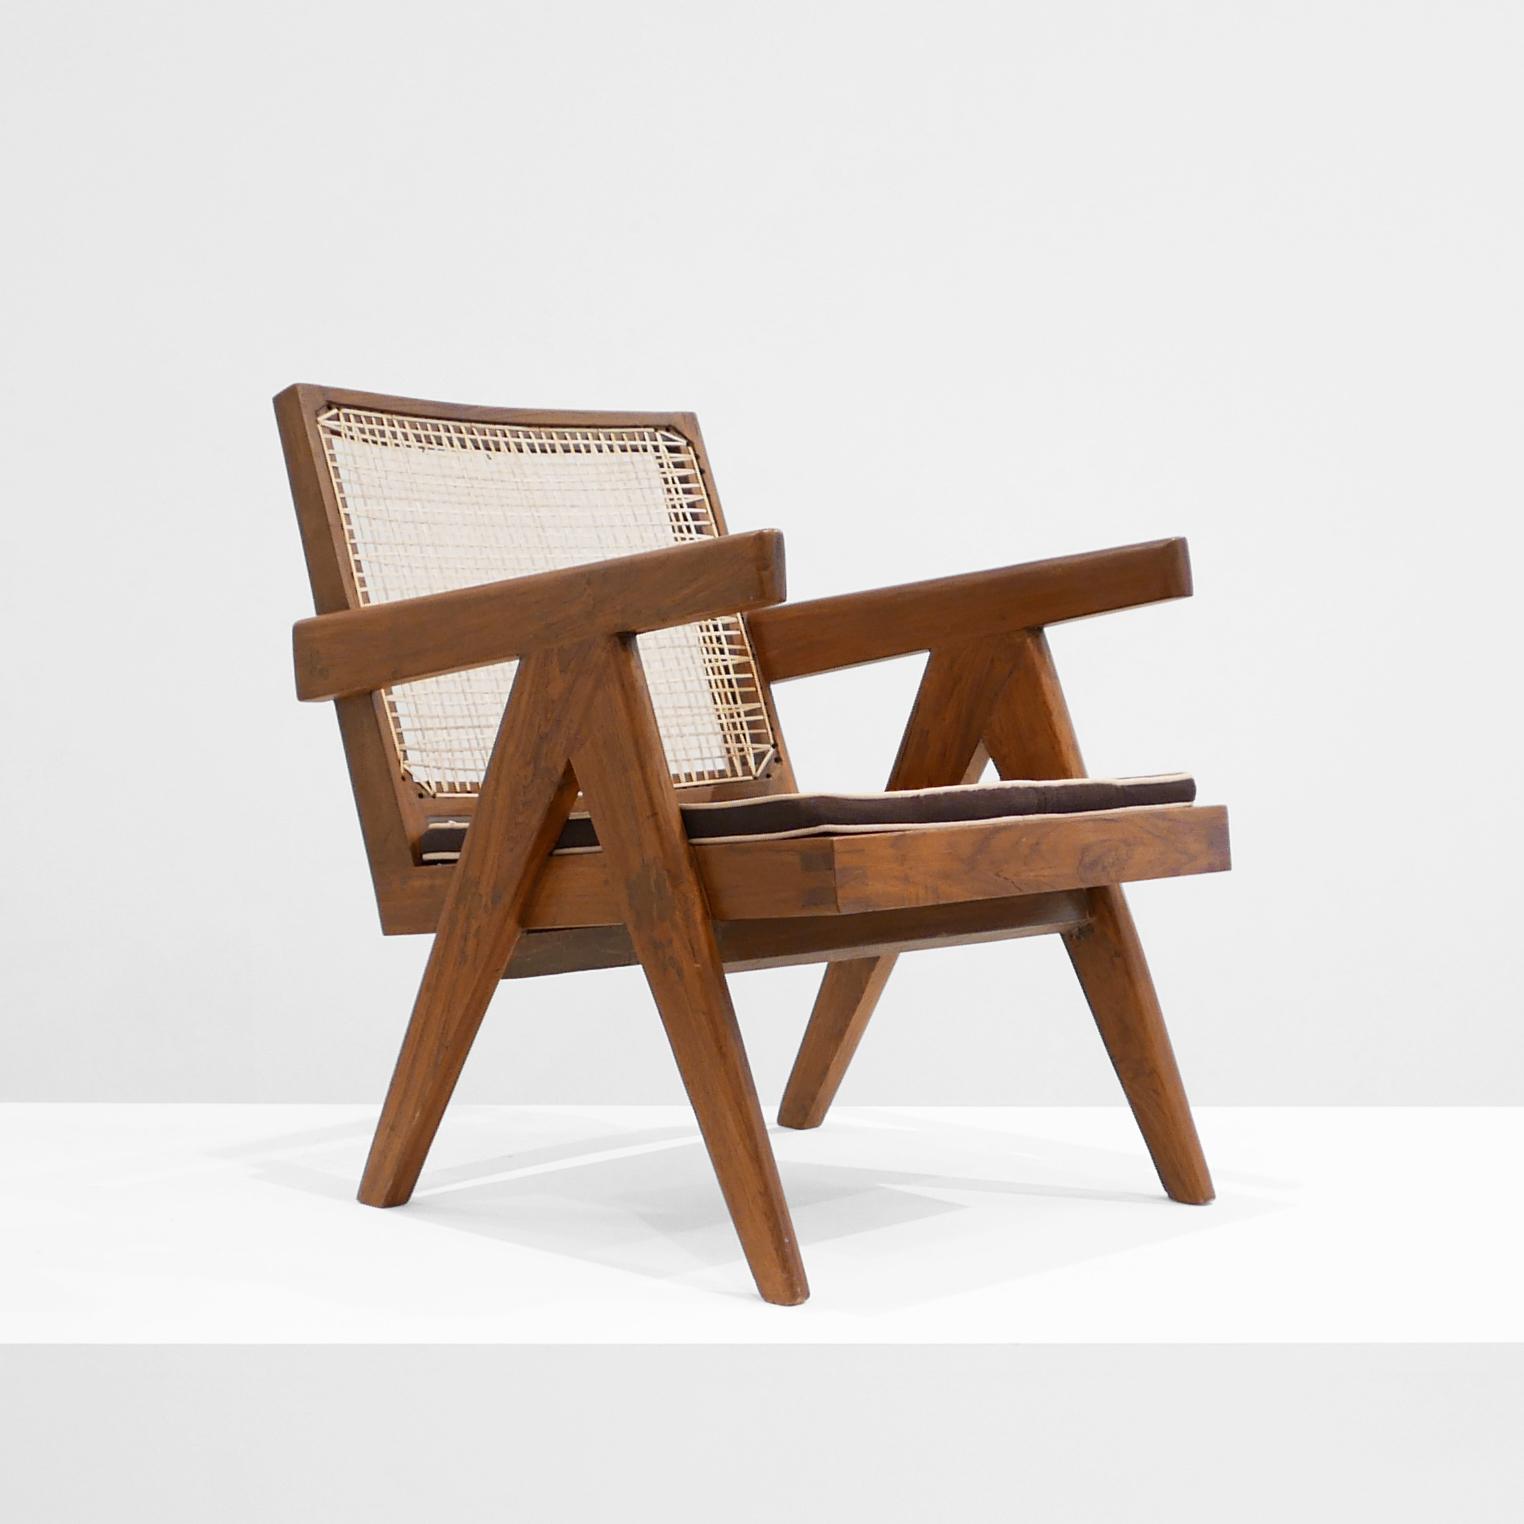 Pierre Jeanneret, Low lounge chair, model PJ-SI-29-A, c. 1955, teak, cane, 24.5H x 20.5W x 29.5D inches_1 s.jpg